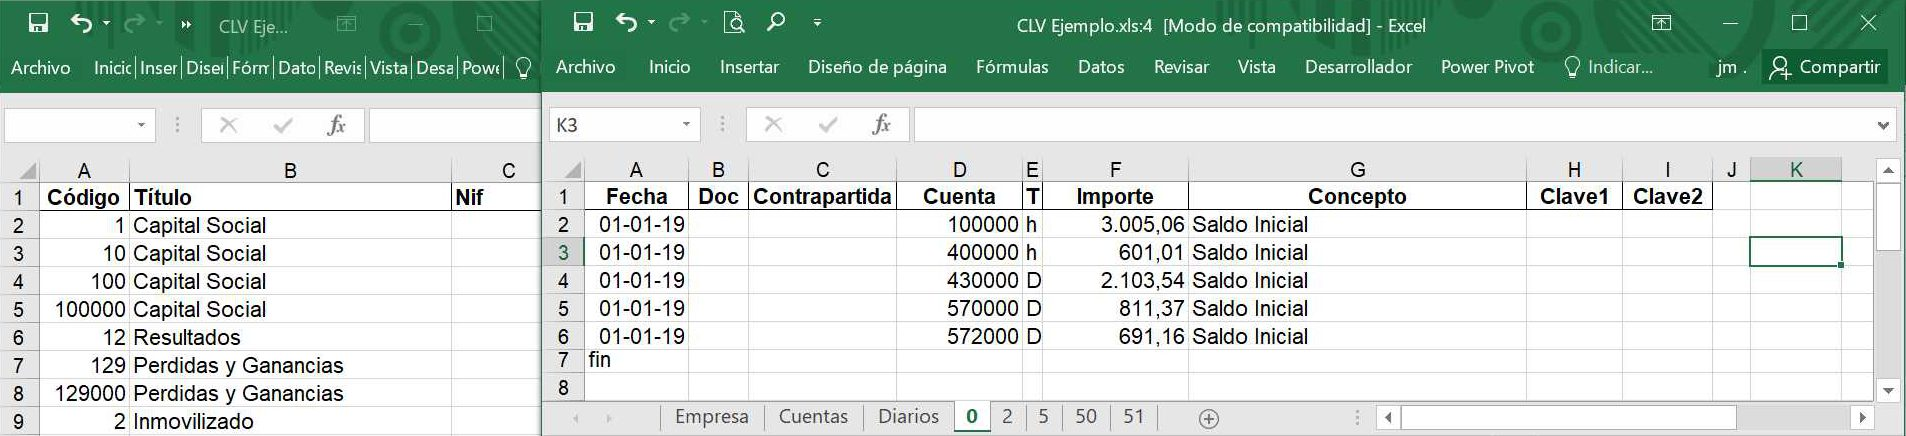 *CLV* Cuenta Logica Visual